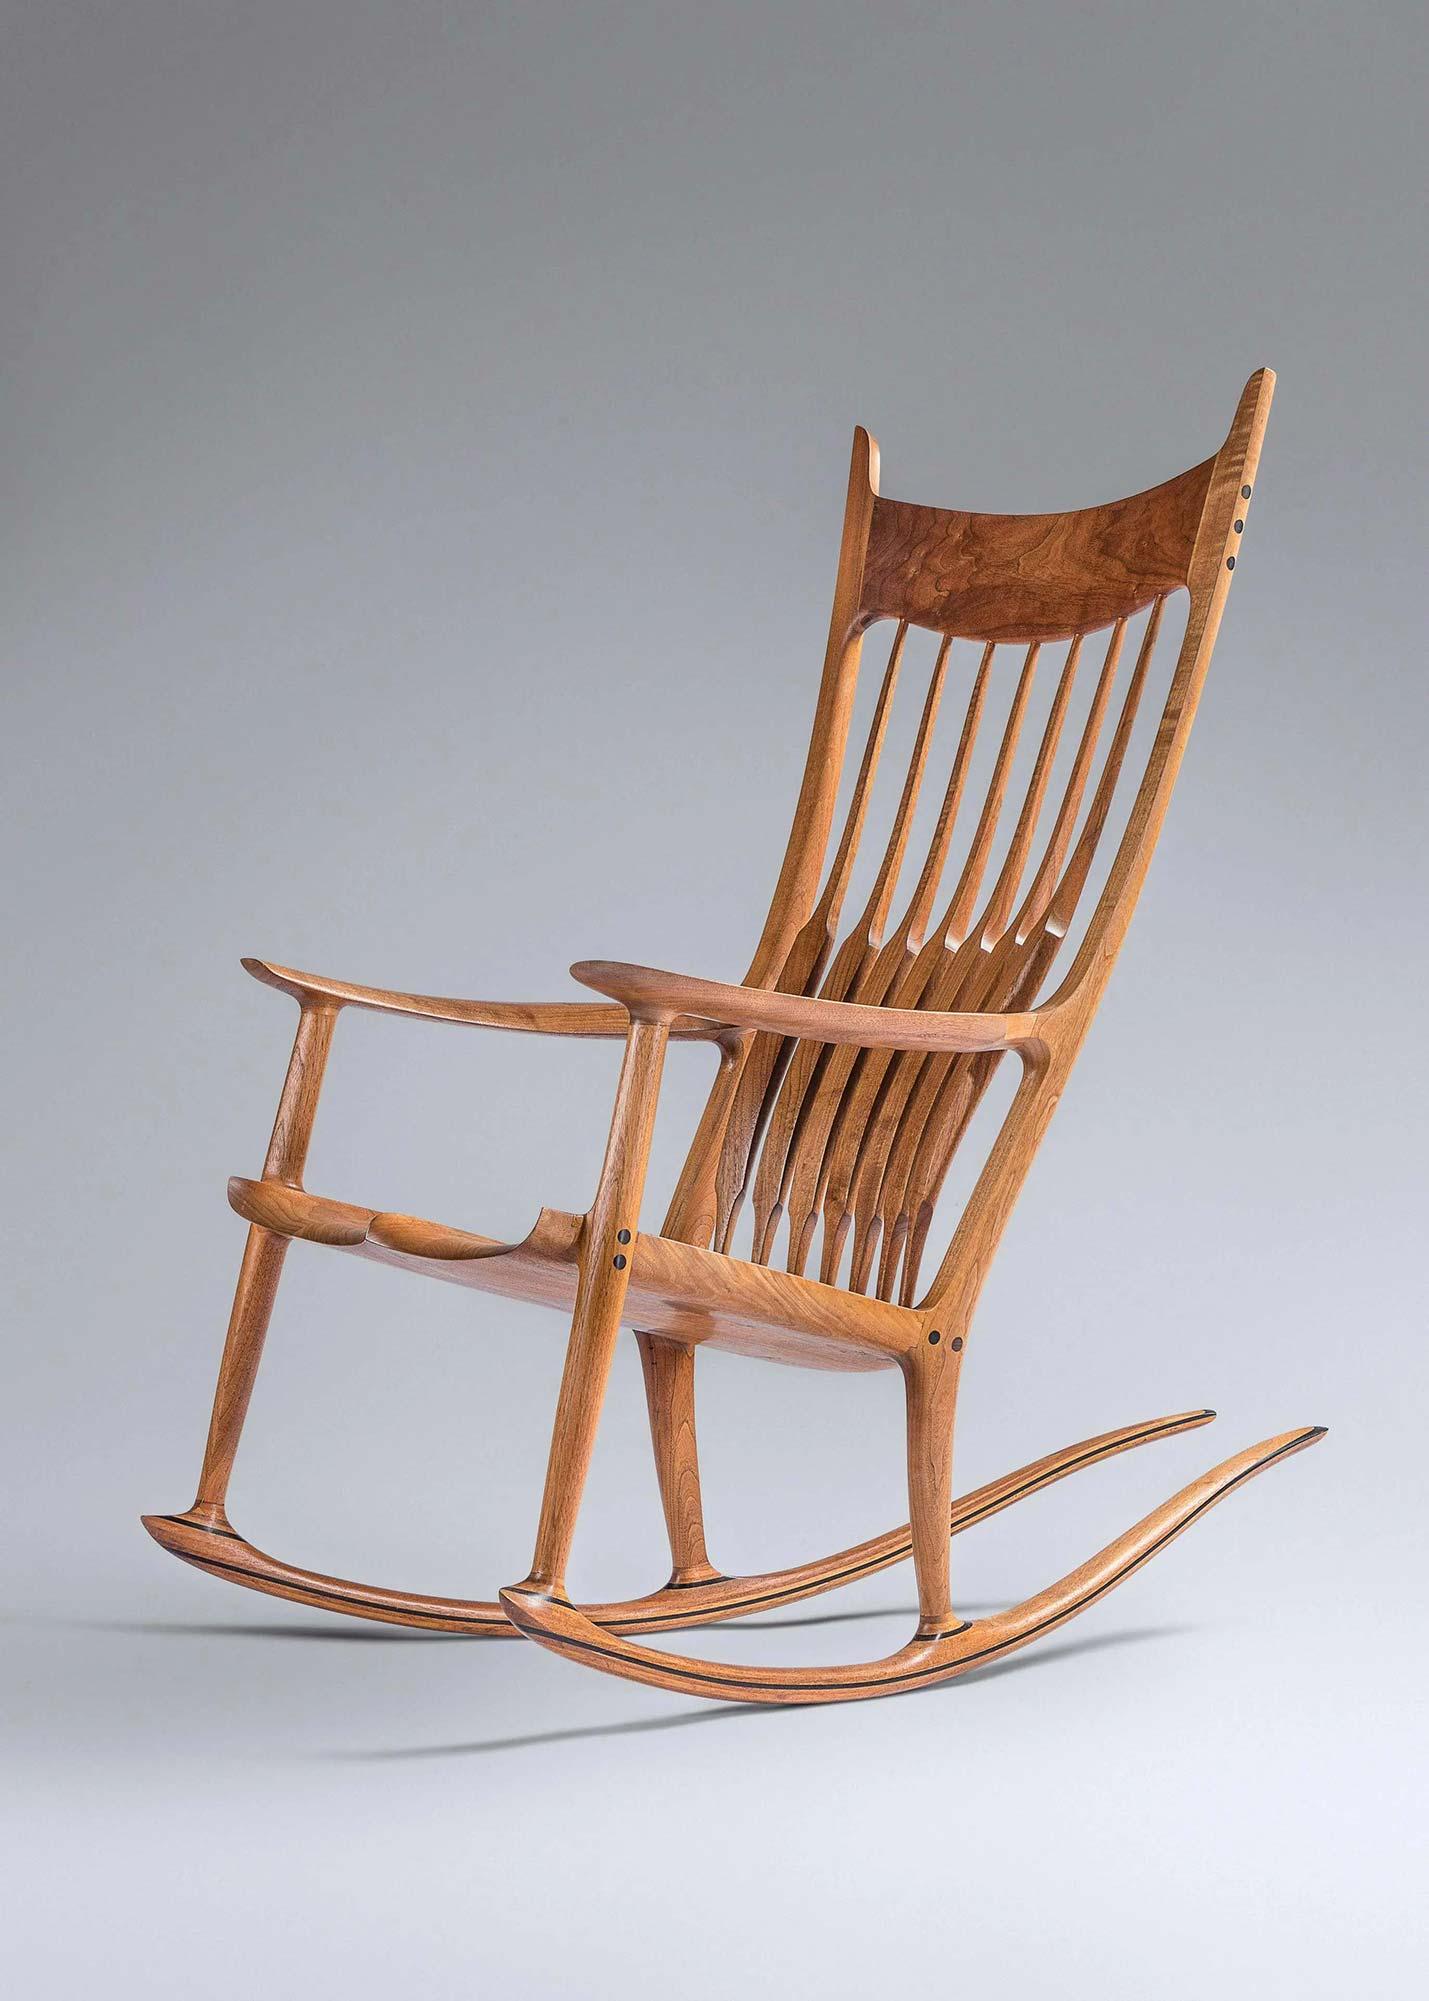 Sam Maloof (1916-2009) Rocking Chair, 1993, $28,500. Image courtesy Hindman